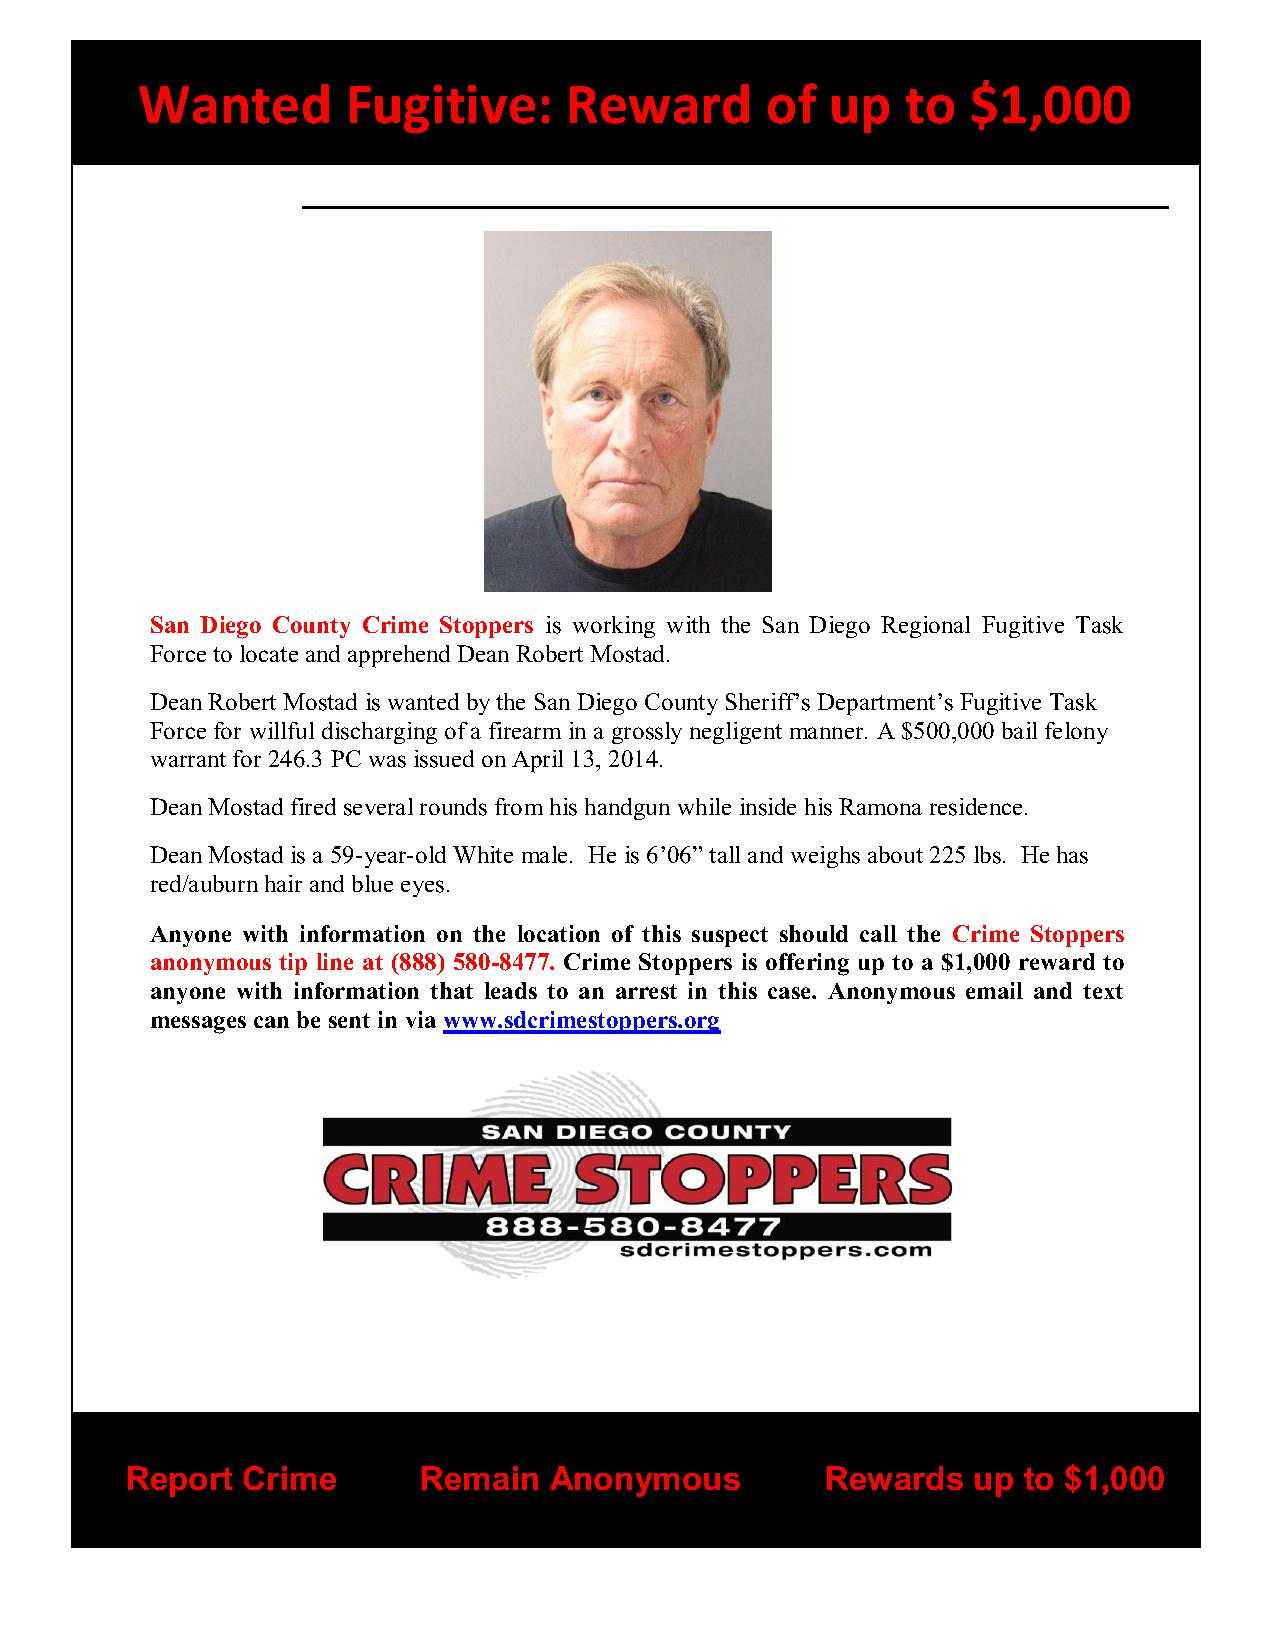 62614 Fugitive Dean Mostad_1